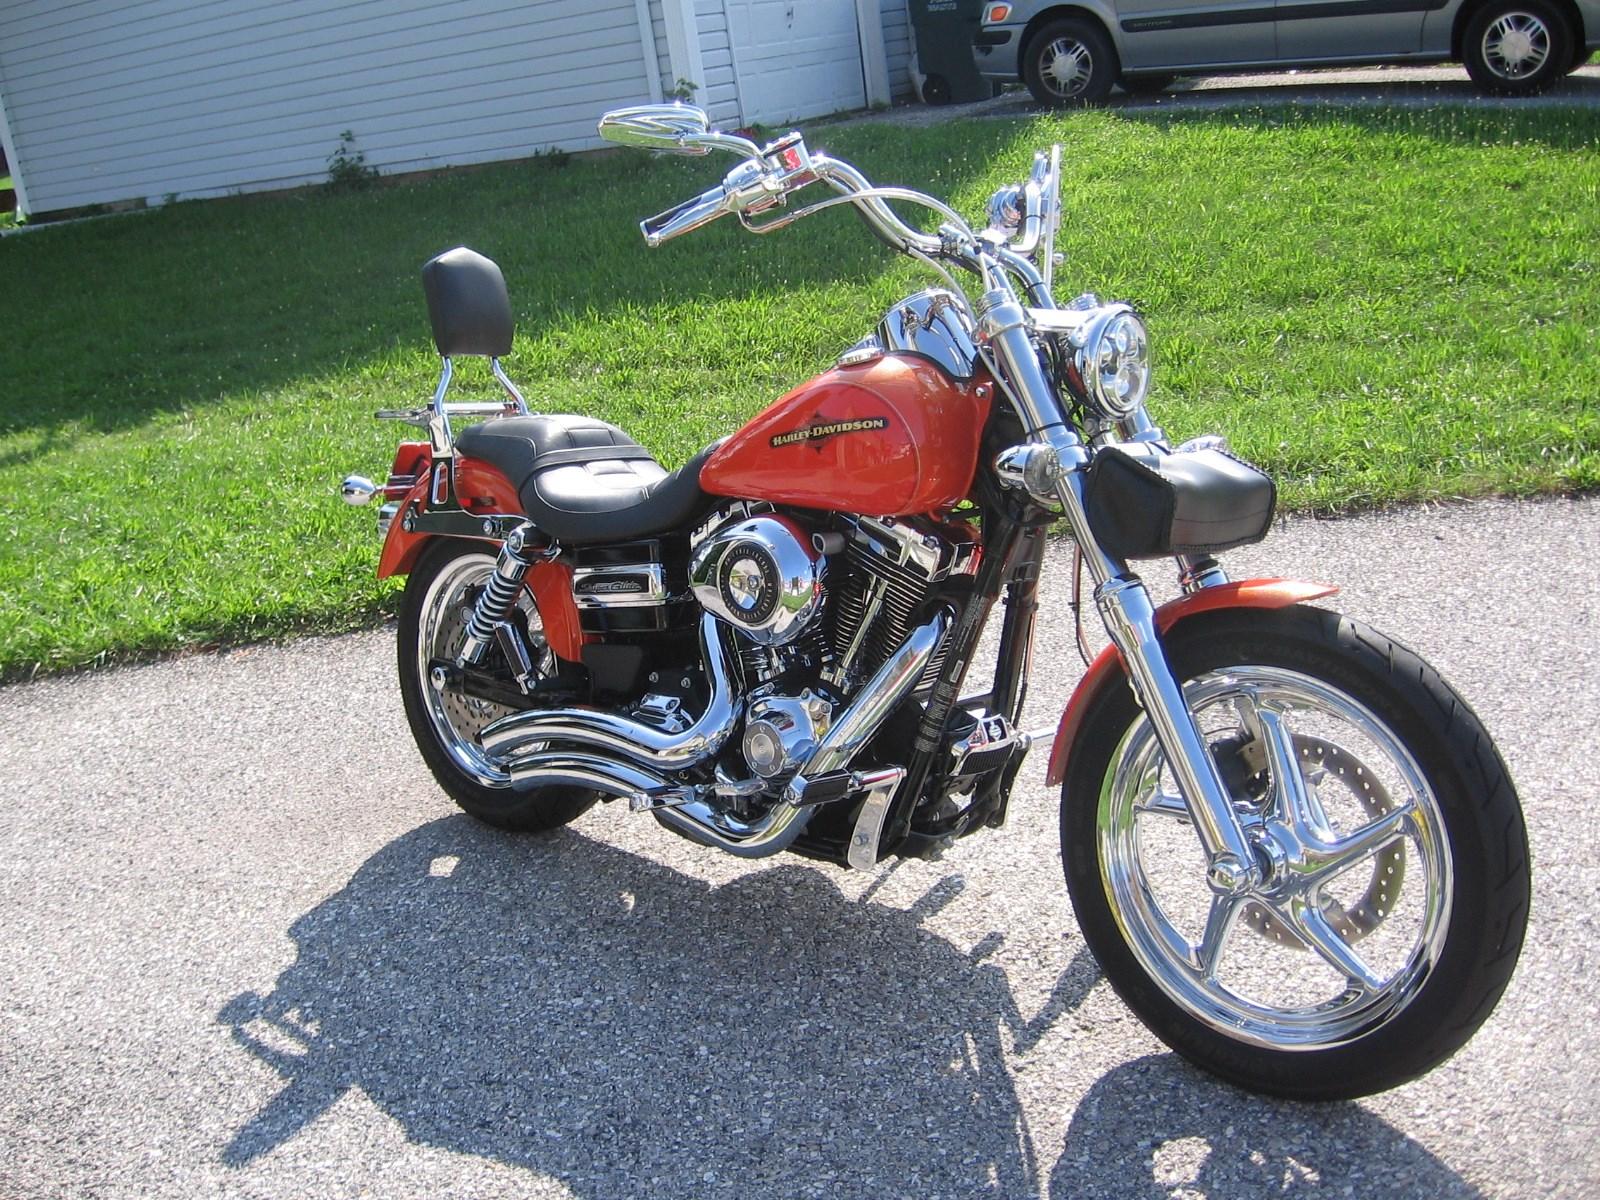 Harley Dyna For Sale Atlanta Ga >> 2012 Harley-Davidson® FXDC Dyna® Super Glide Custom (Harley Orange & Tequila Sunrise Orange ...